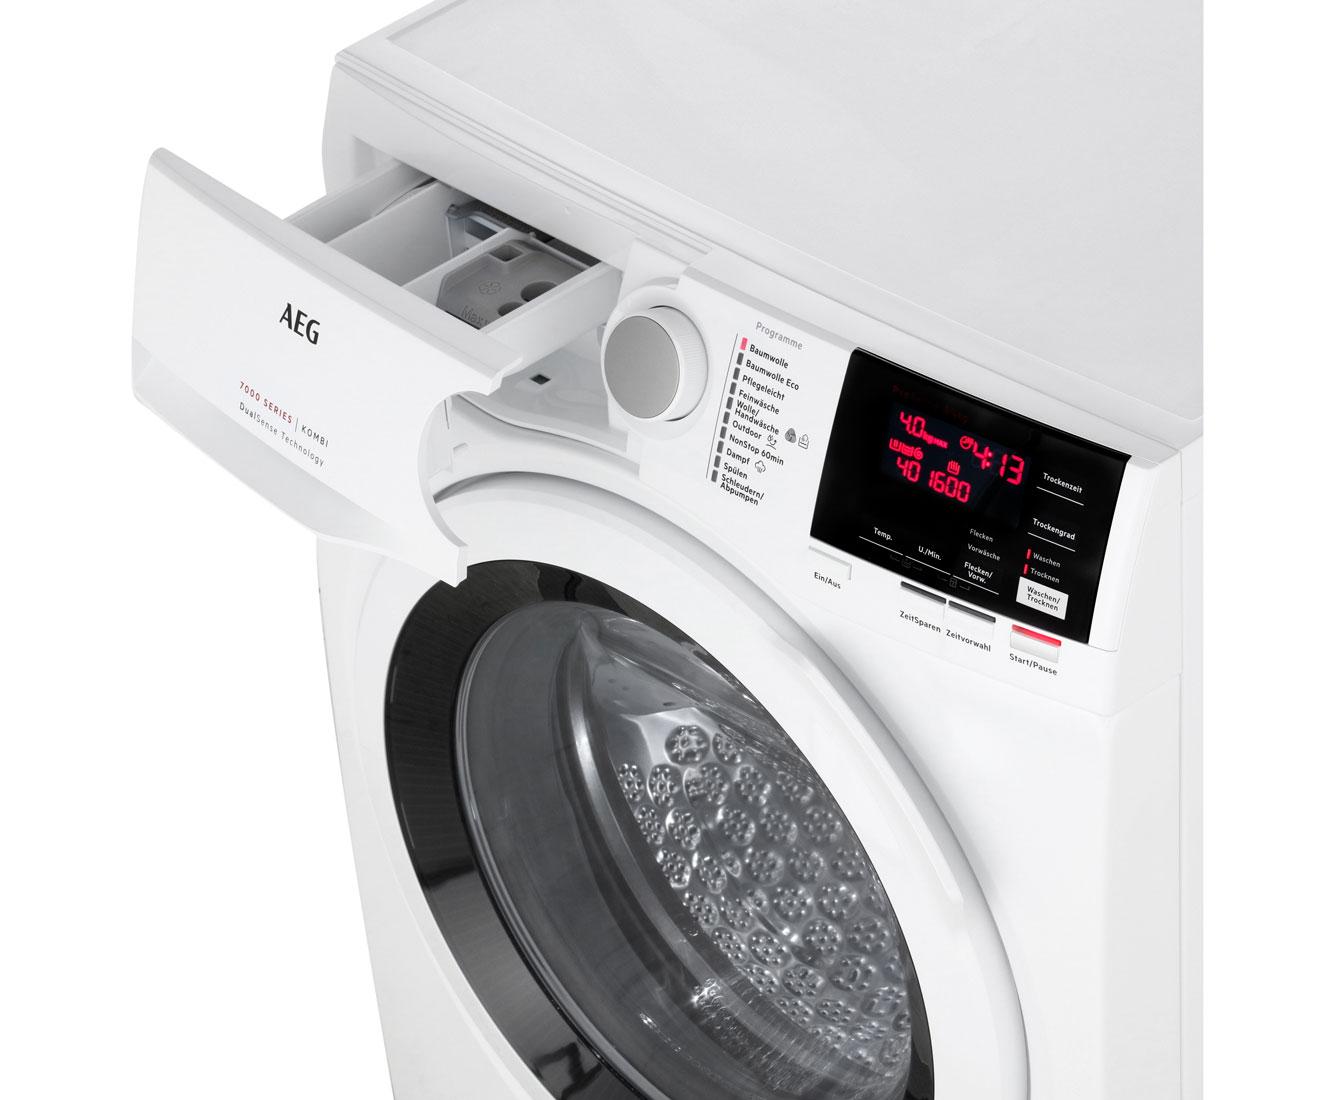 Aeg l7wb65684 lavamat kombi waschtrockner freistehend weiss neu ebay